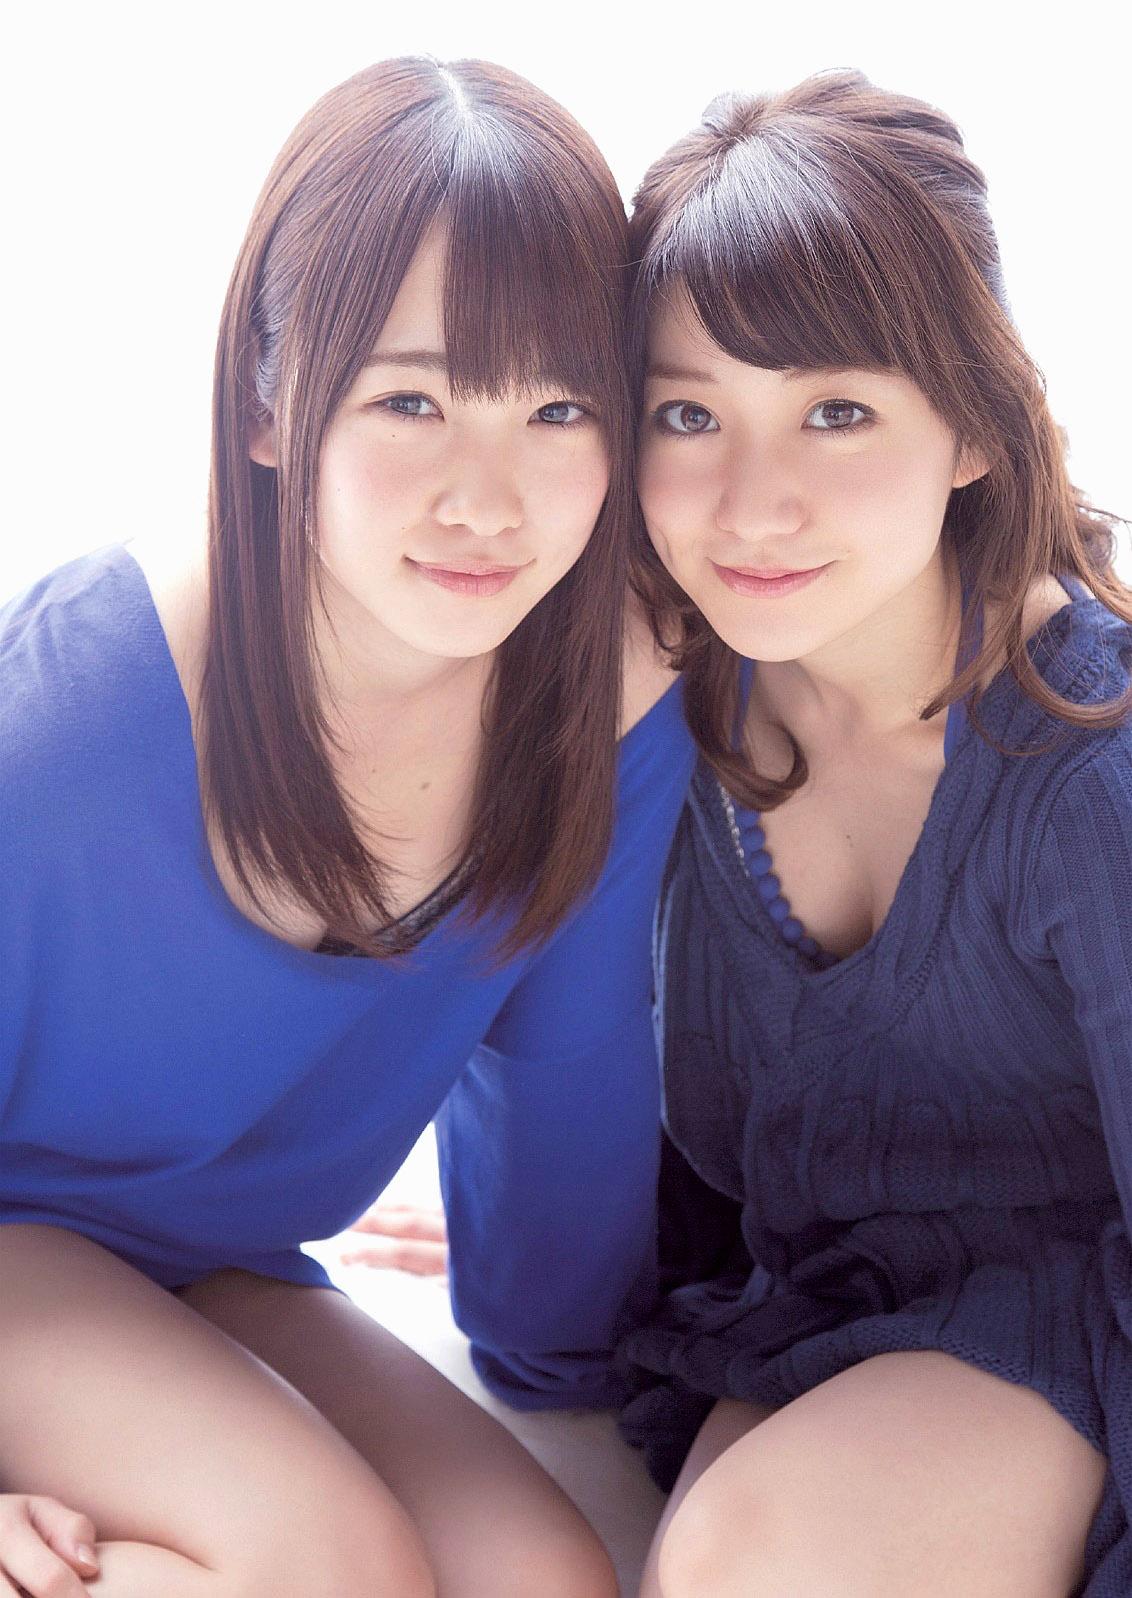 YOshima RKawaei WPB 140127 02.jpg